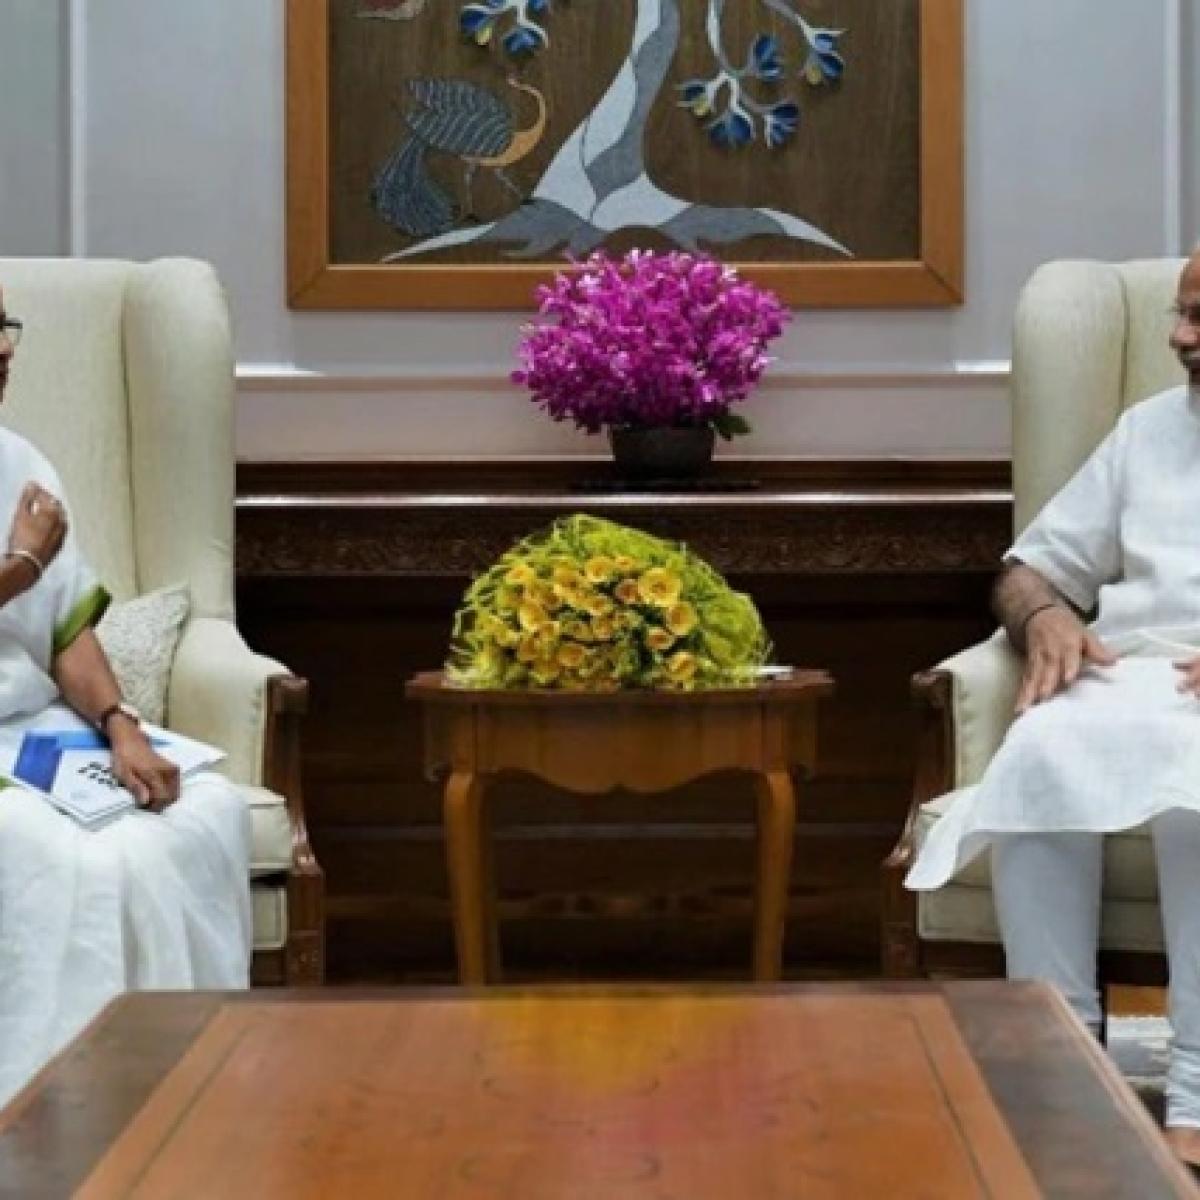 Coronavirus Update: Mamata Banerjee writes to PM Modi to stop all flights from landing in West Bengal